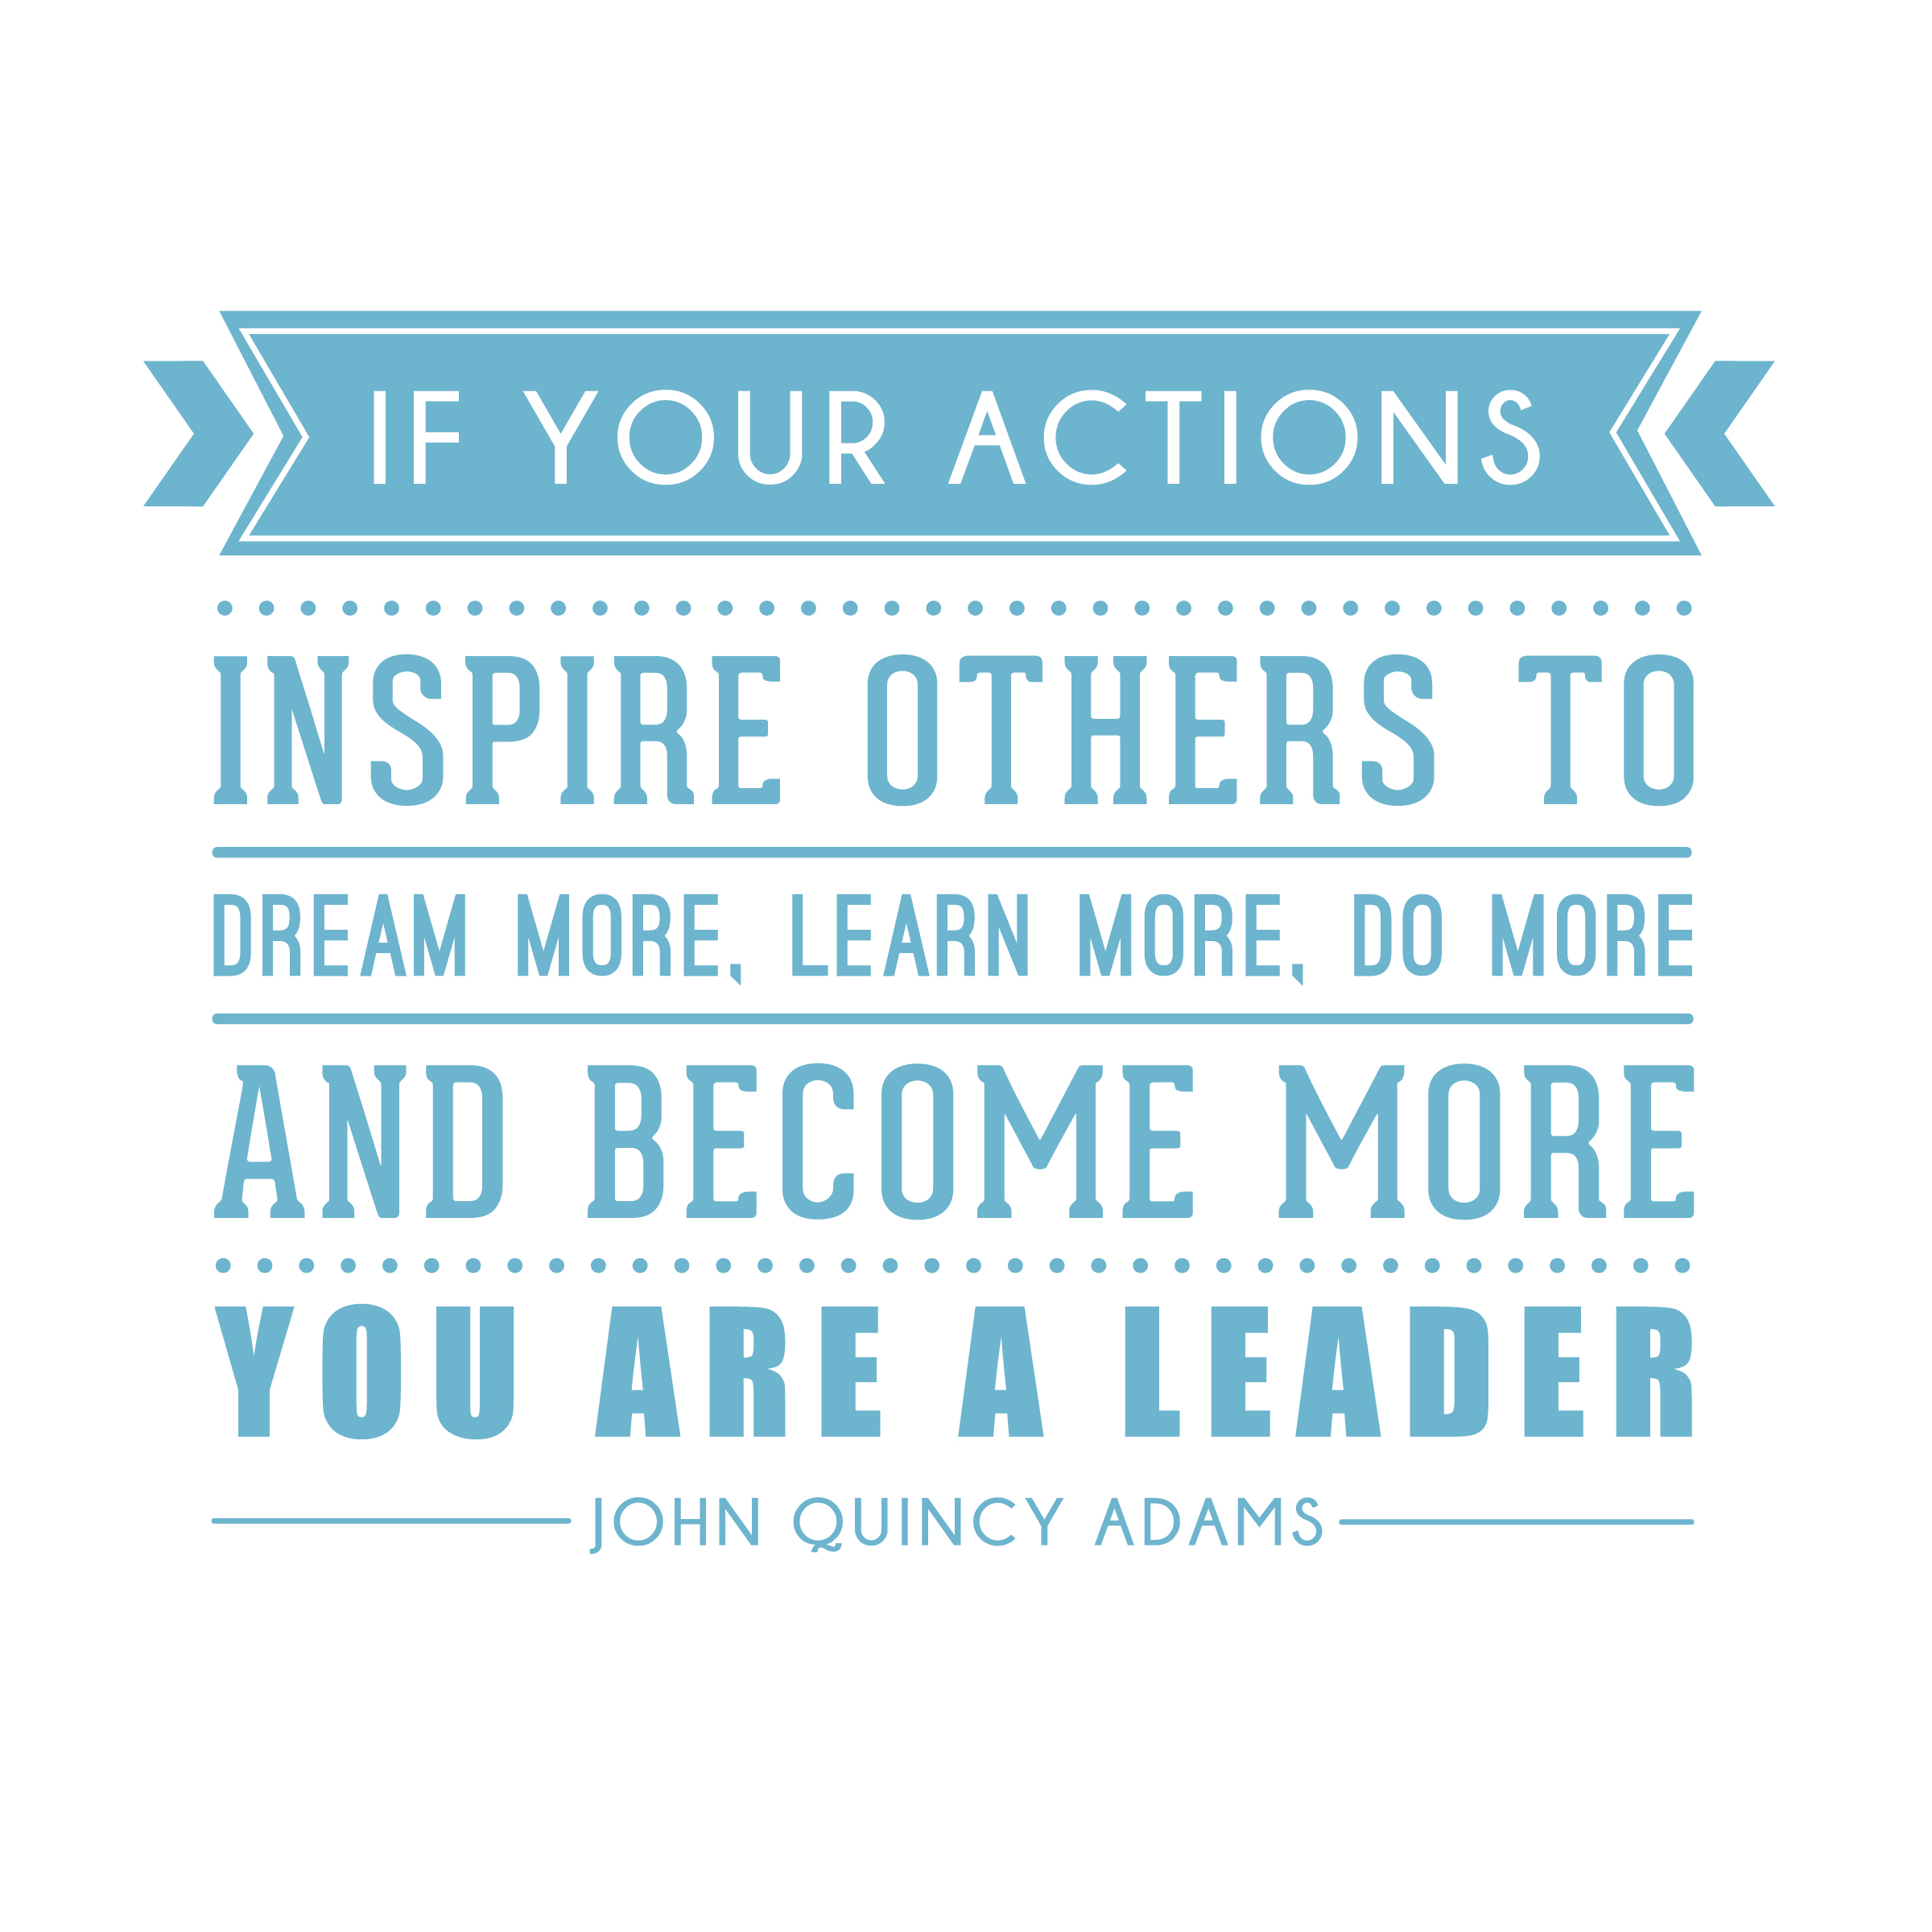 leadership gala quotes alicia hamon